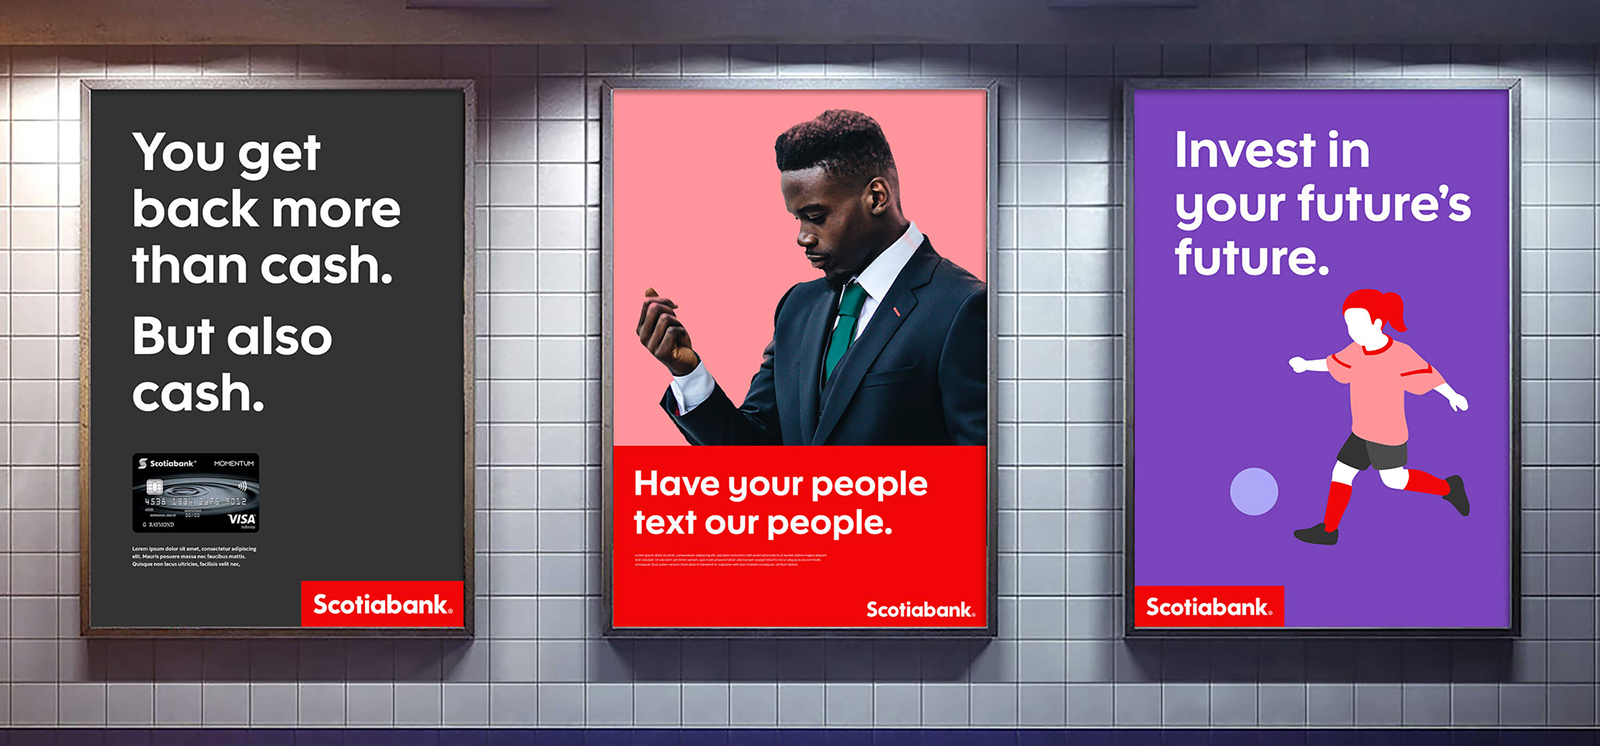 Scotiabank啟用全新的品牌logo和VI視覺形象設計-深圳VI設計9